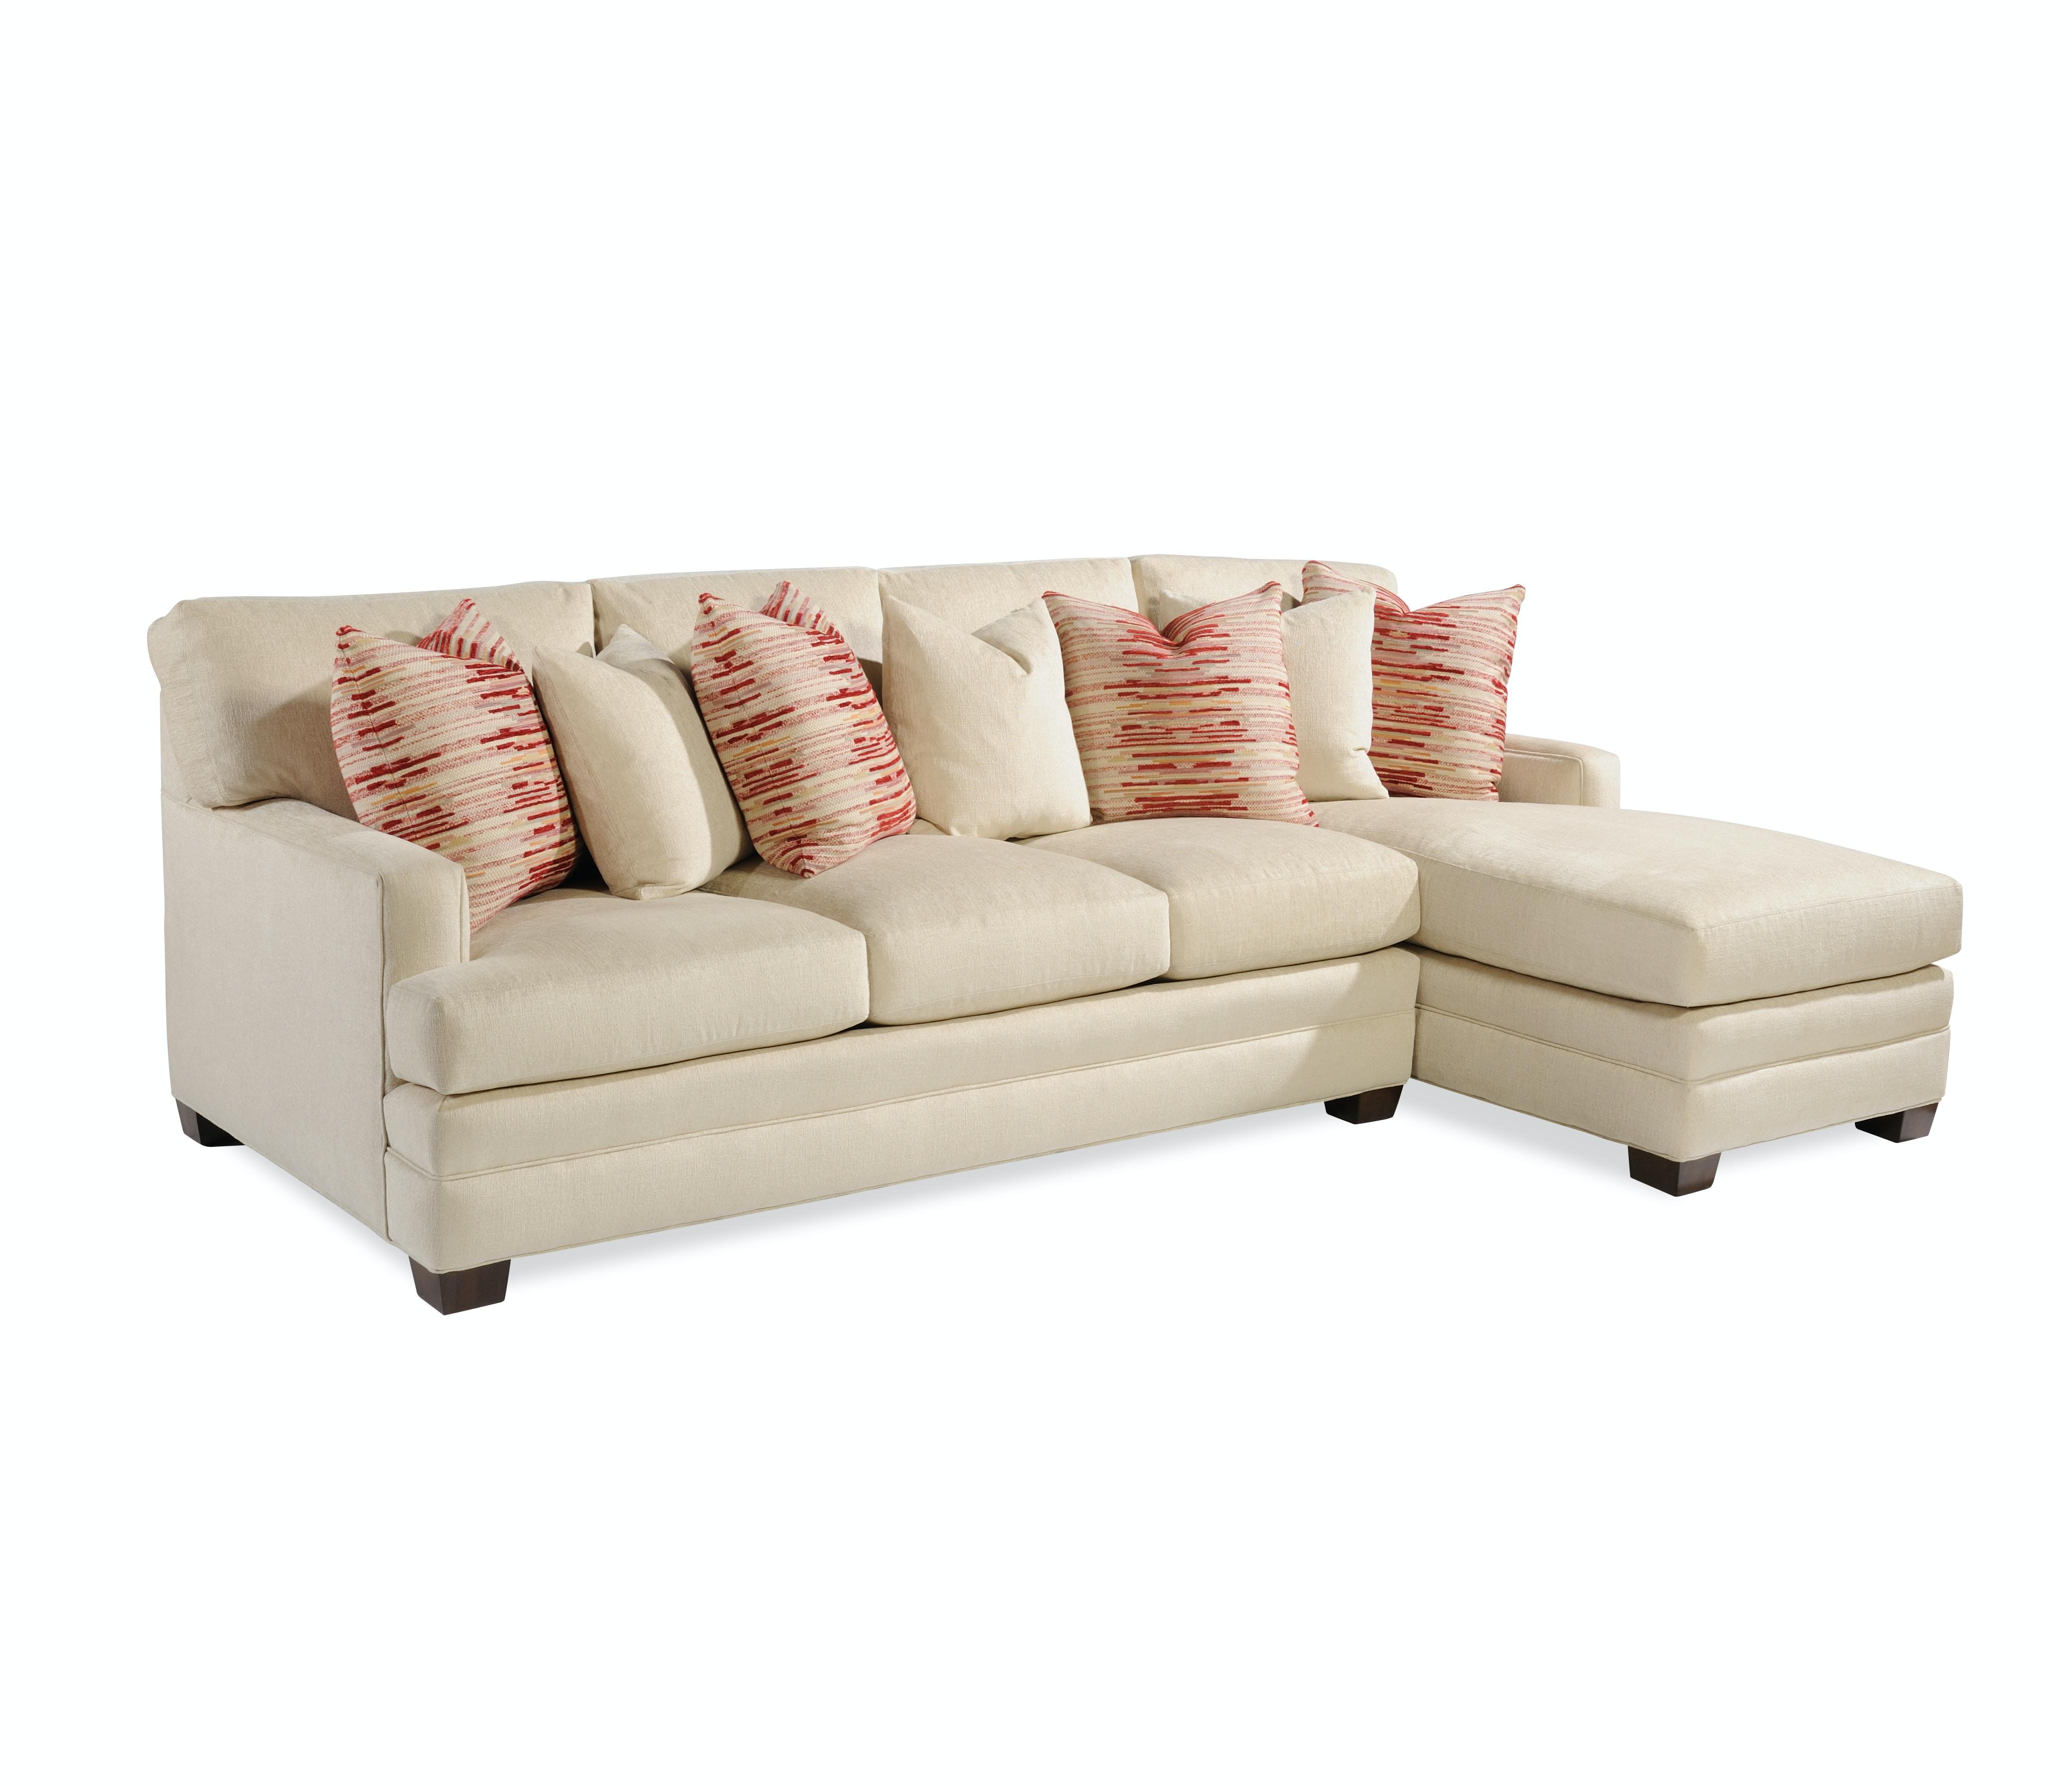 taylor king sofa valencia leather recliner sofas thesofa